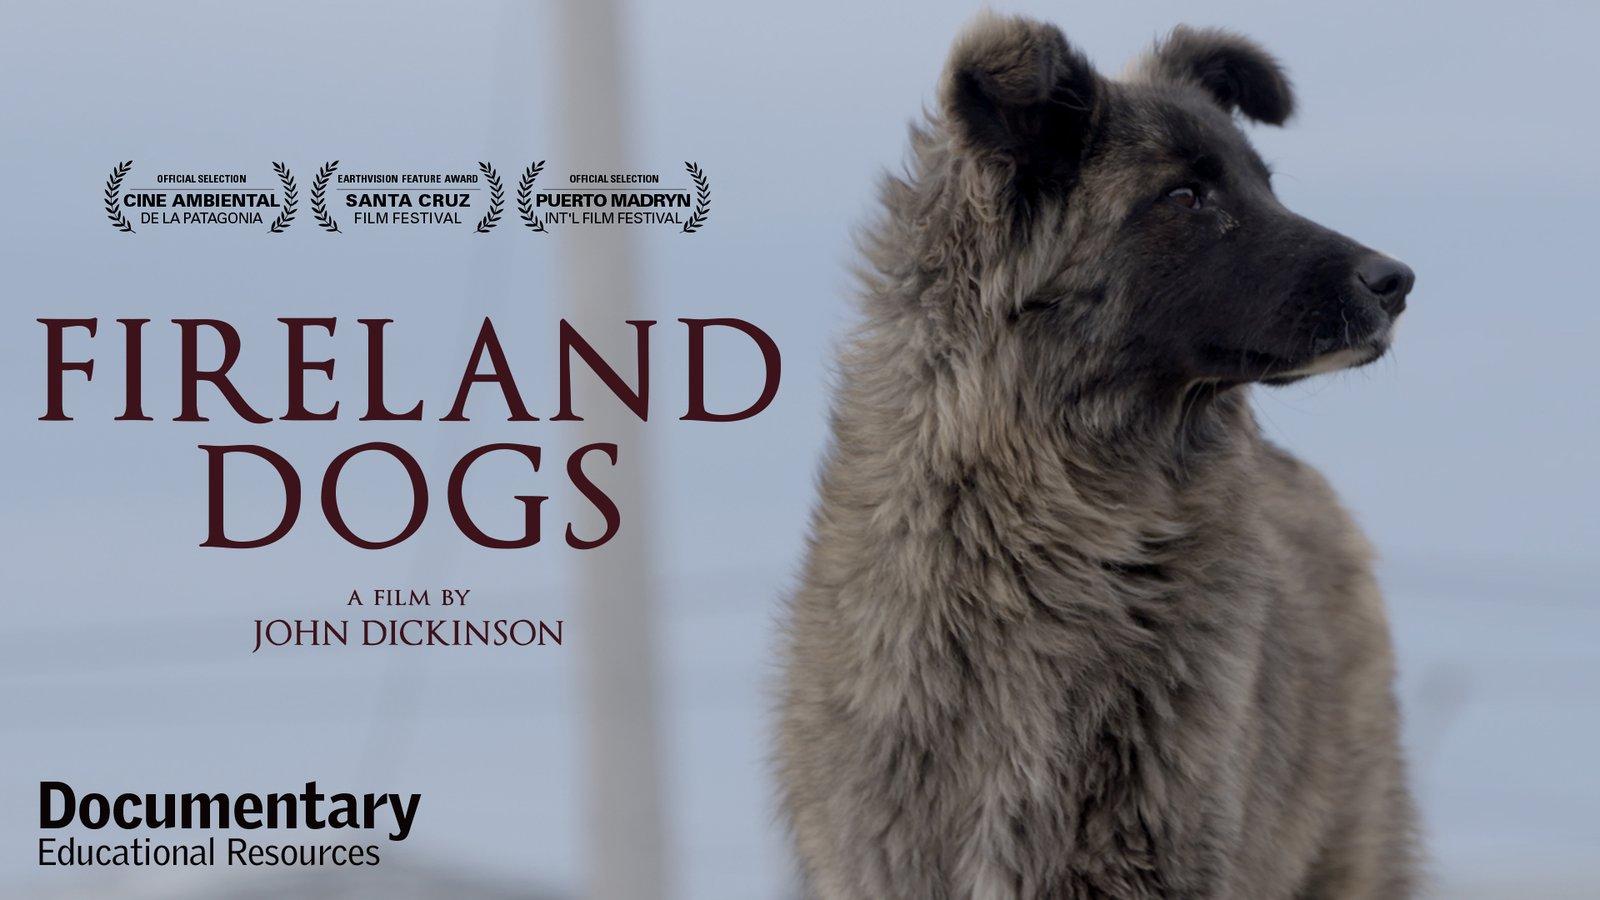 Fireland Dogs